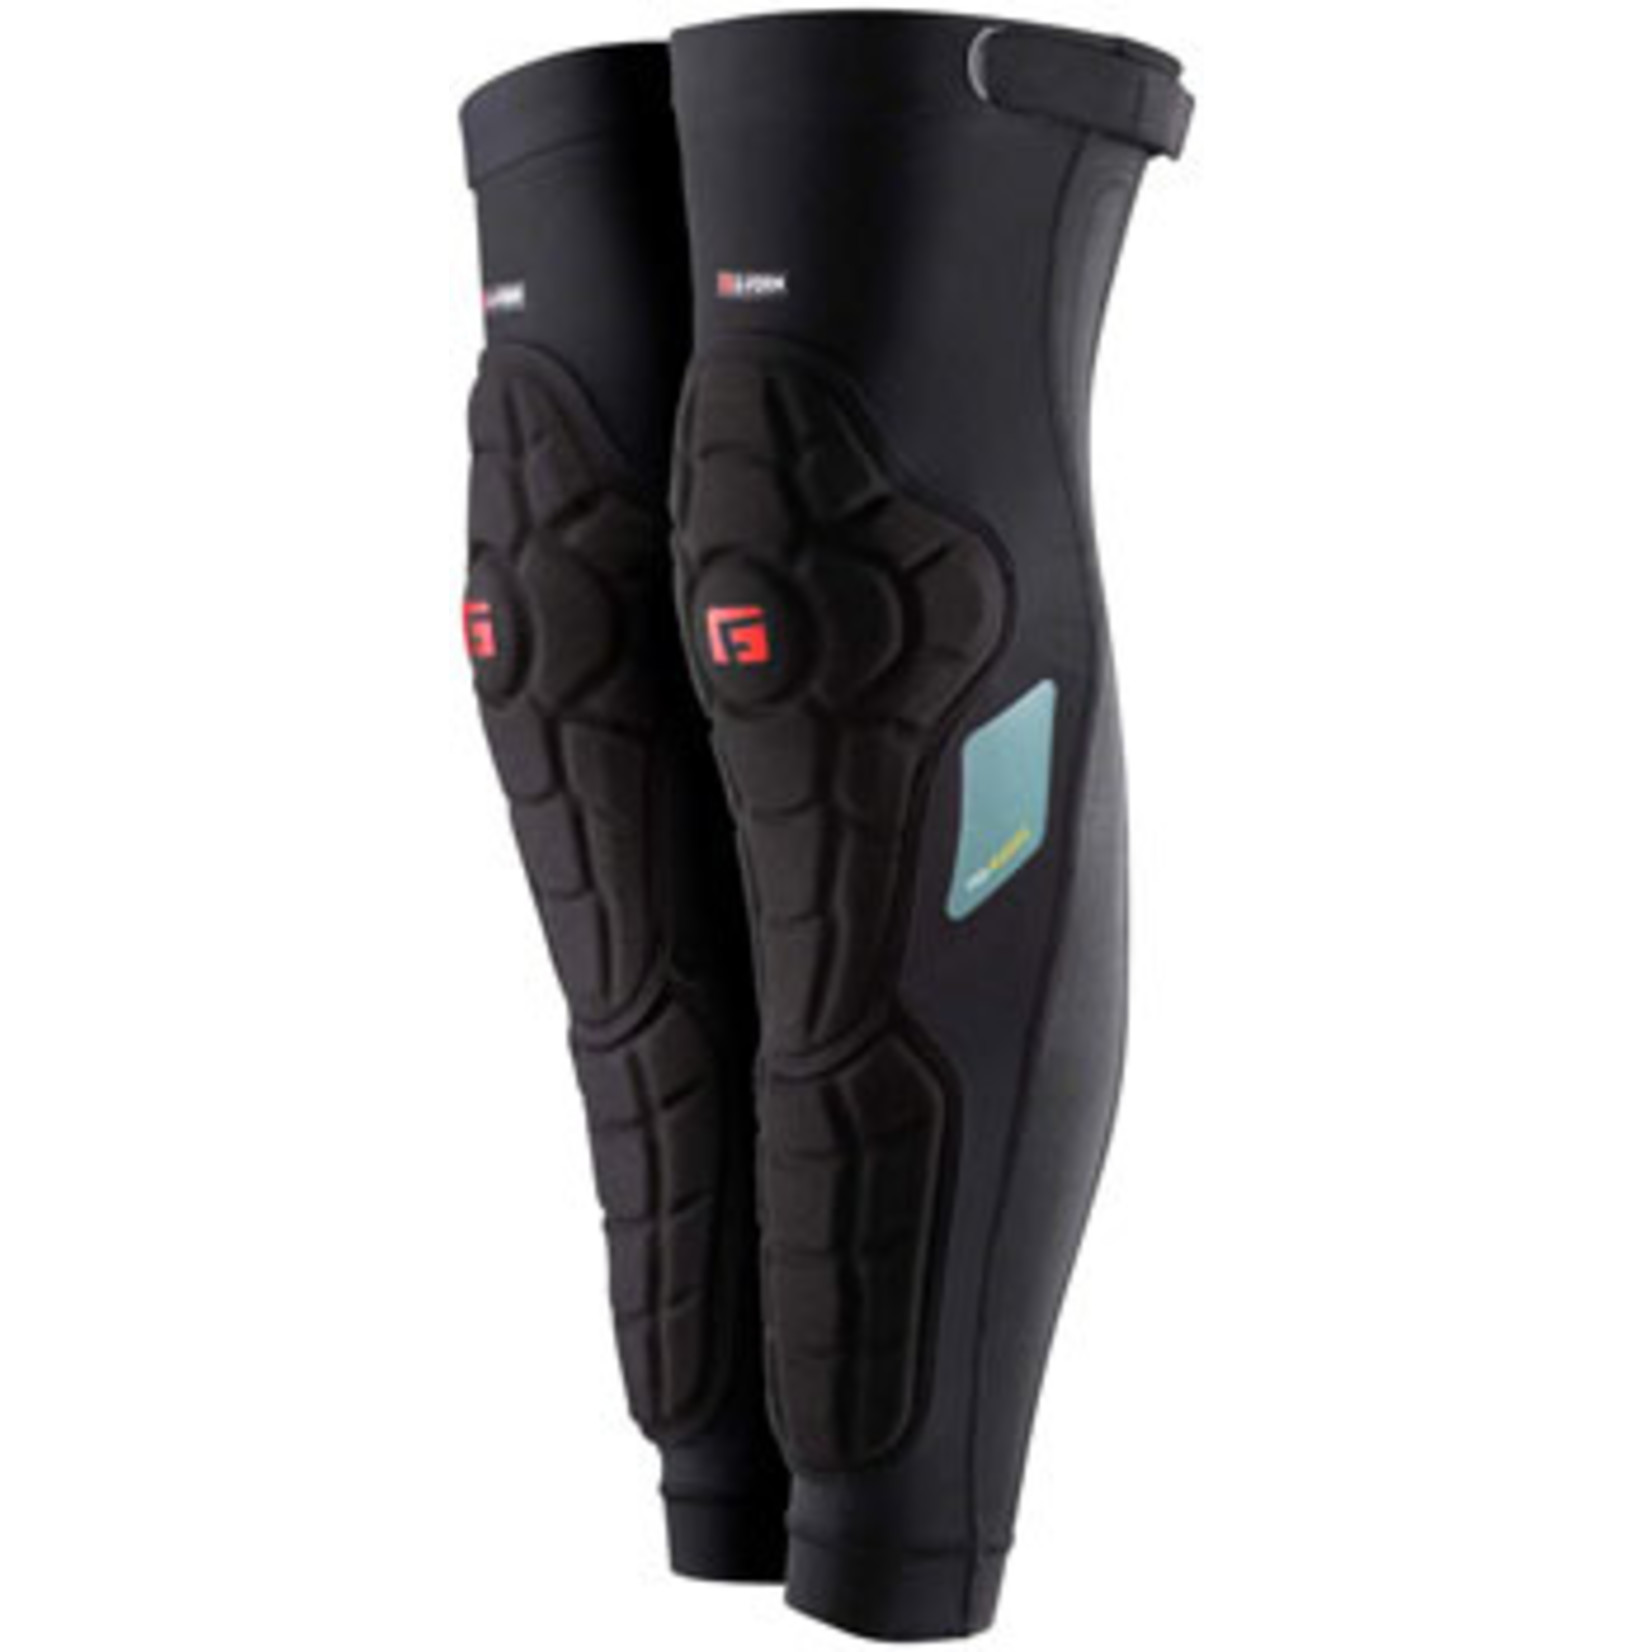 G-Form G-Form Pro Rugged Knee-Shin Guards - Black, Medium